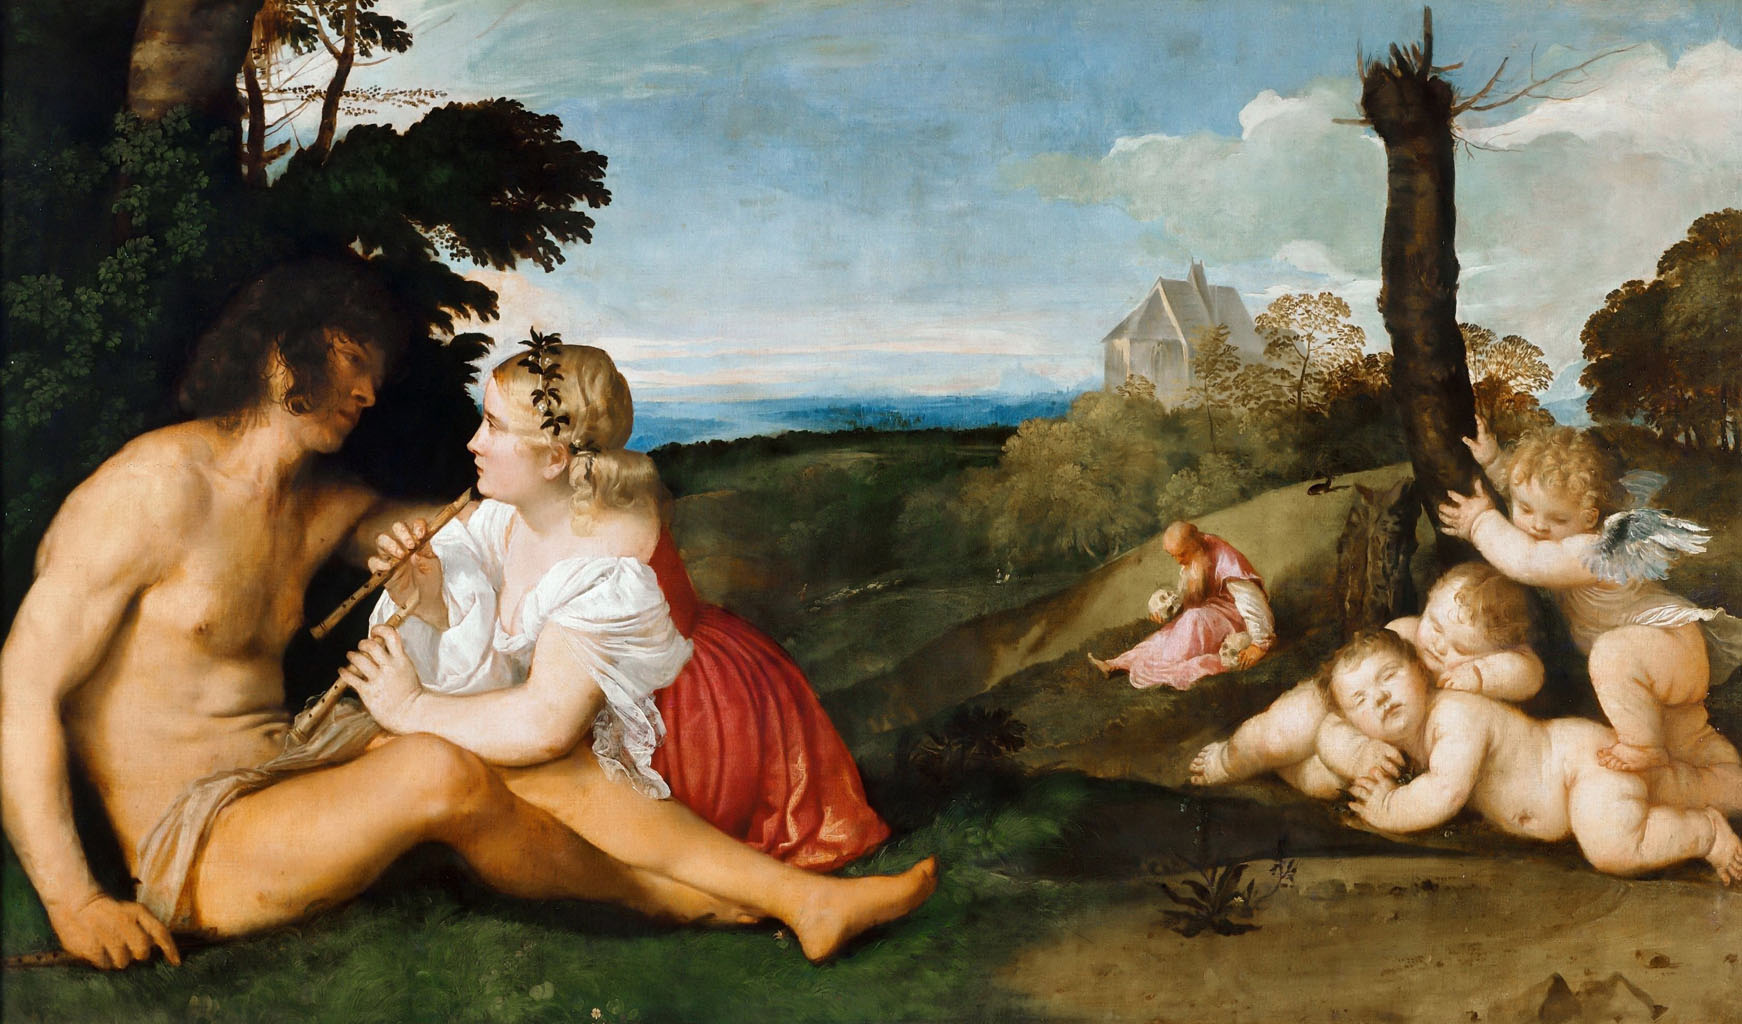 Тициан Вечеллио (Tiziano Vecellio), Аллегория трех возрастов мужчины